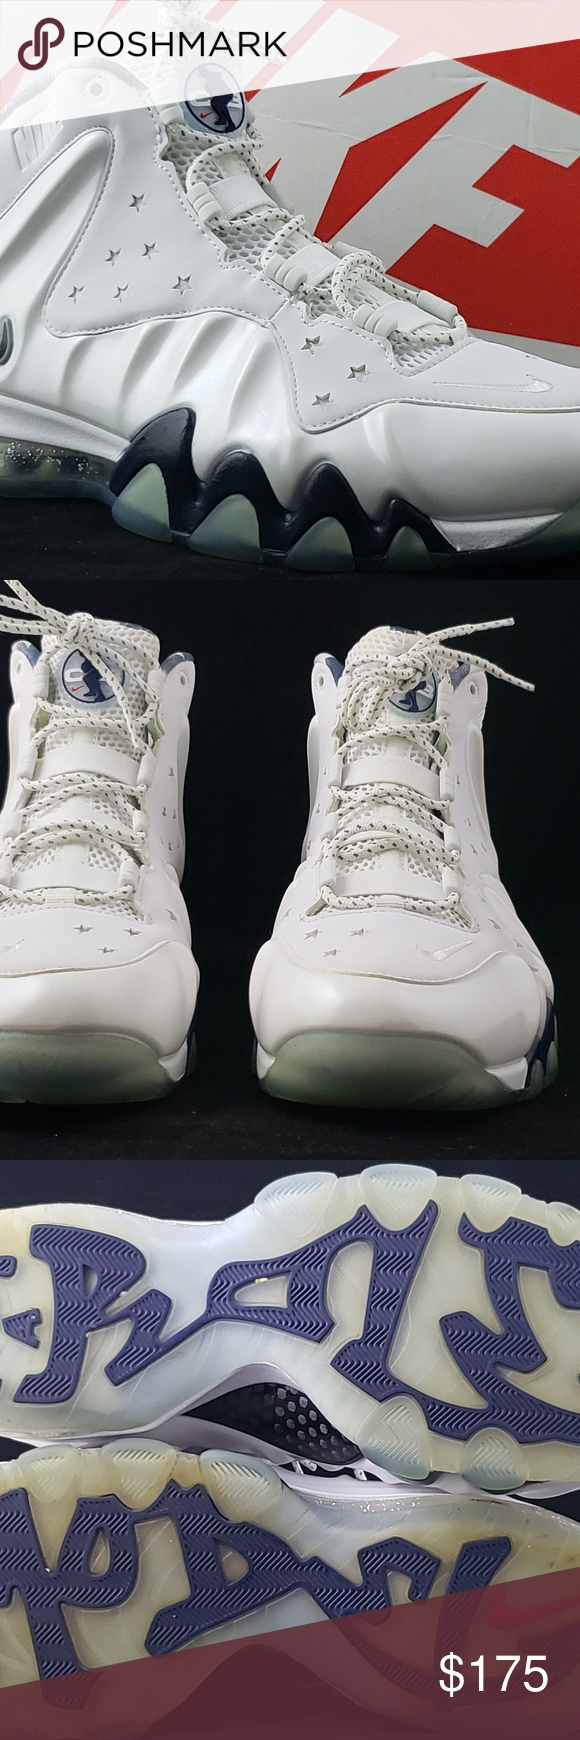 edc37da6a84 🎉HP🎉 Nike Charles Barkley Posite Max Prm Nike Barkley Posite Max Color   White